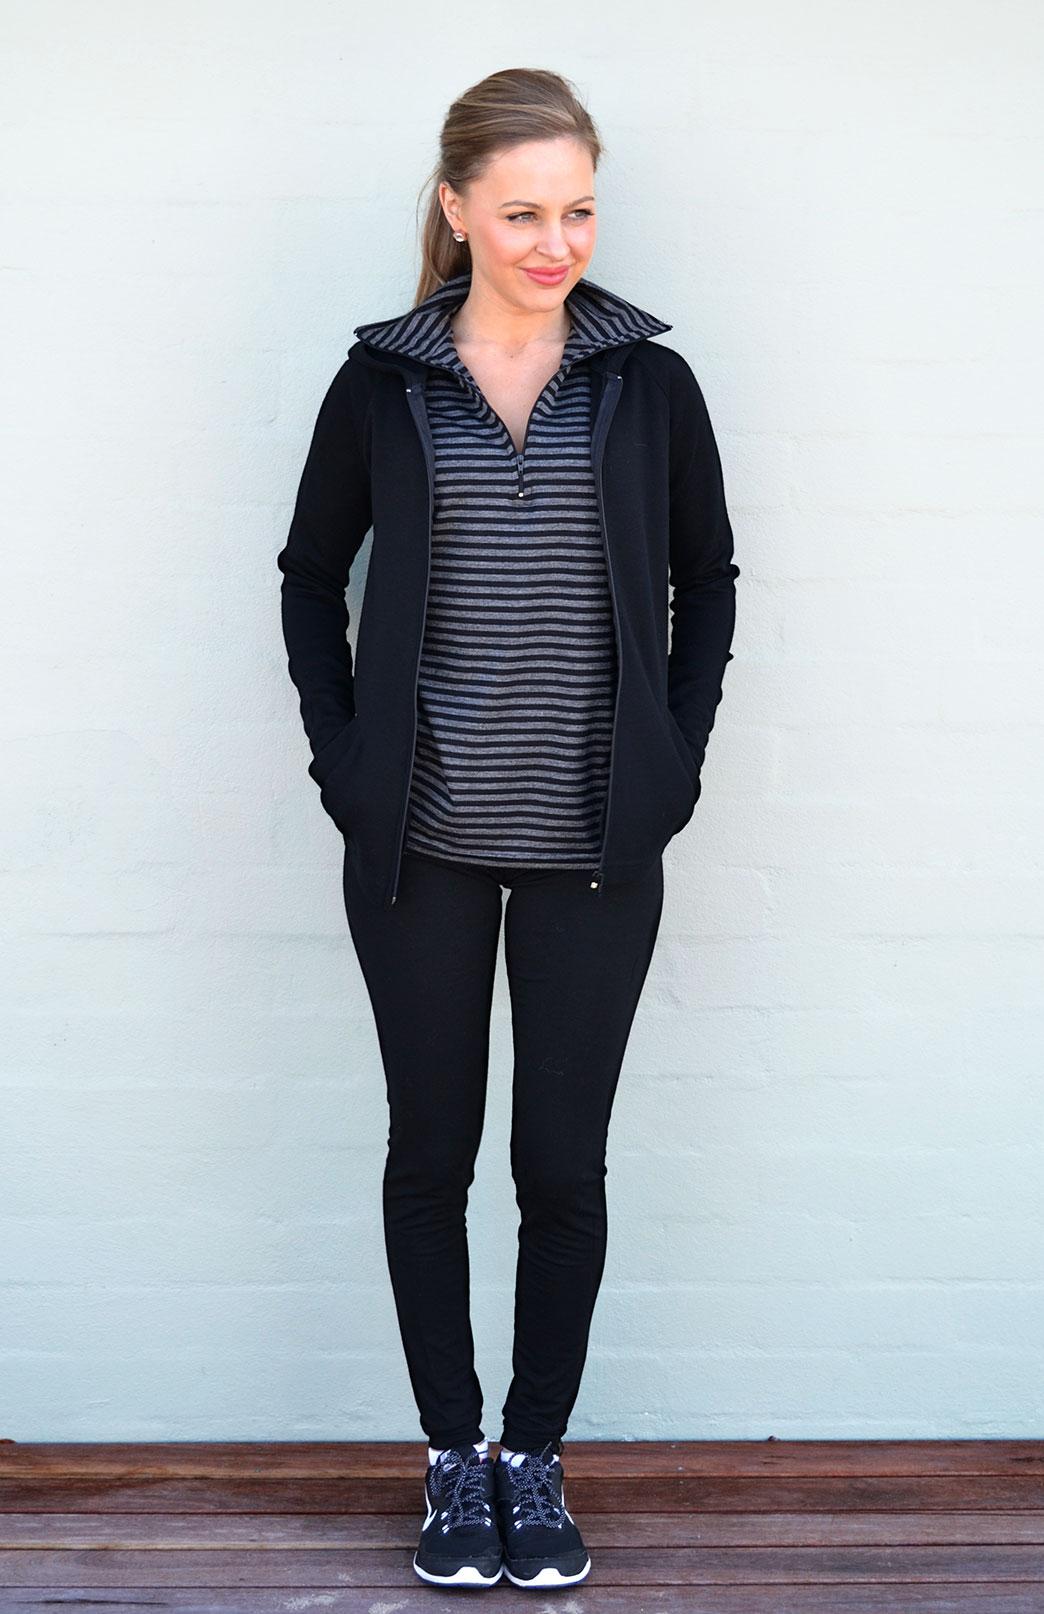 Wool Fleece Hoody Jacket-350g - Women's 100% Merino Wool Fleece Zip Jacket with Hood - Smitten Merino Tasmania Australia